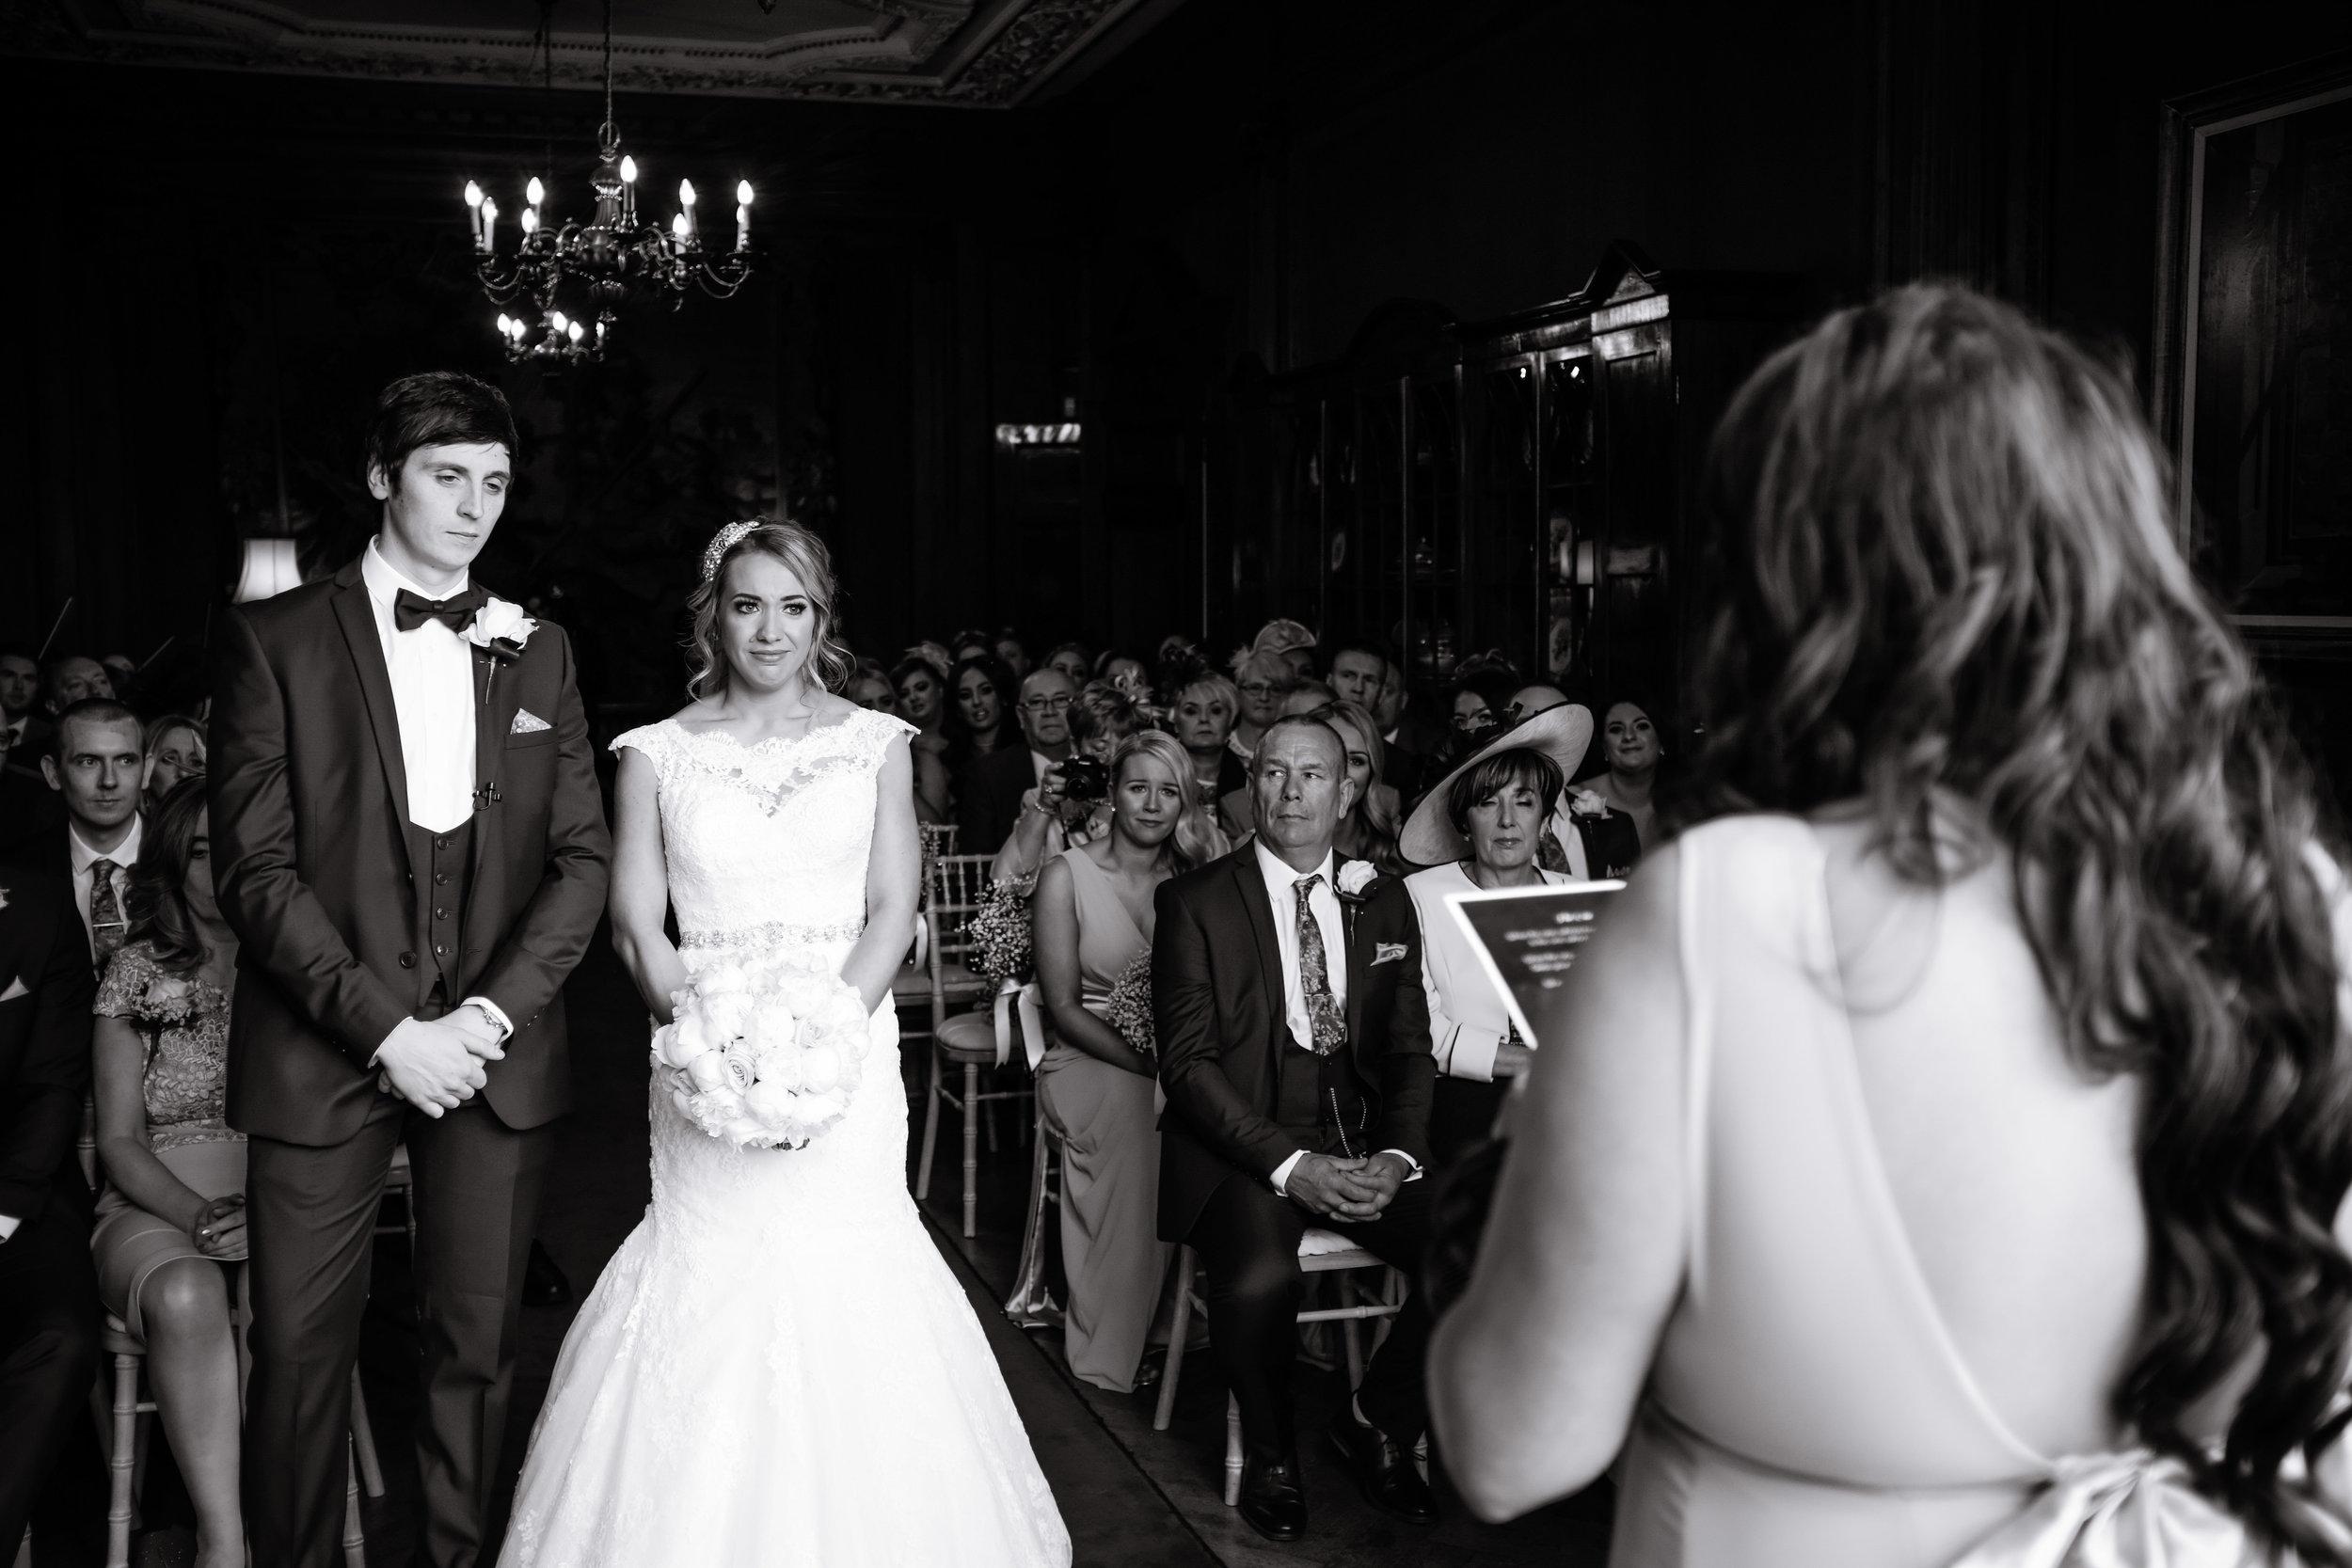 Thornton manor wedding photography cheshire wedding photographer liverpool manchester warrington chester wirral wedding BLOG (36 of 108).jpg